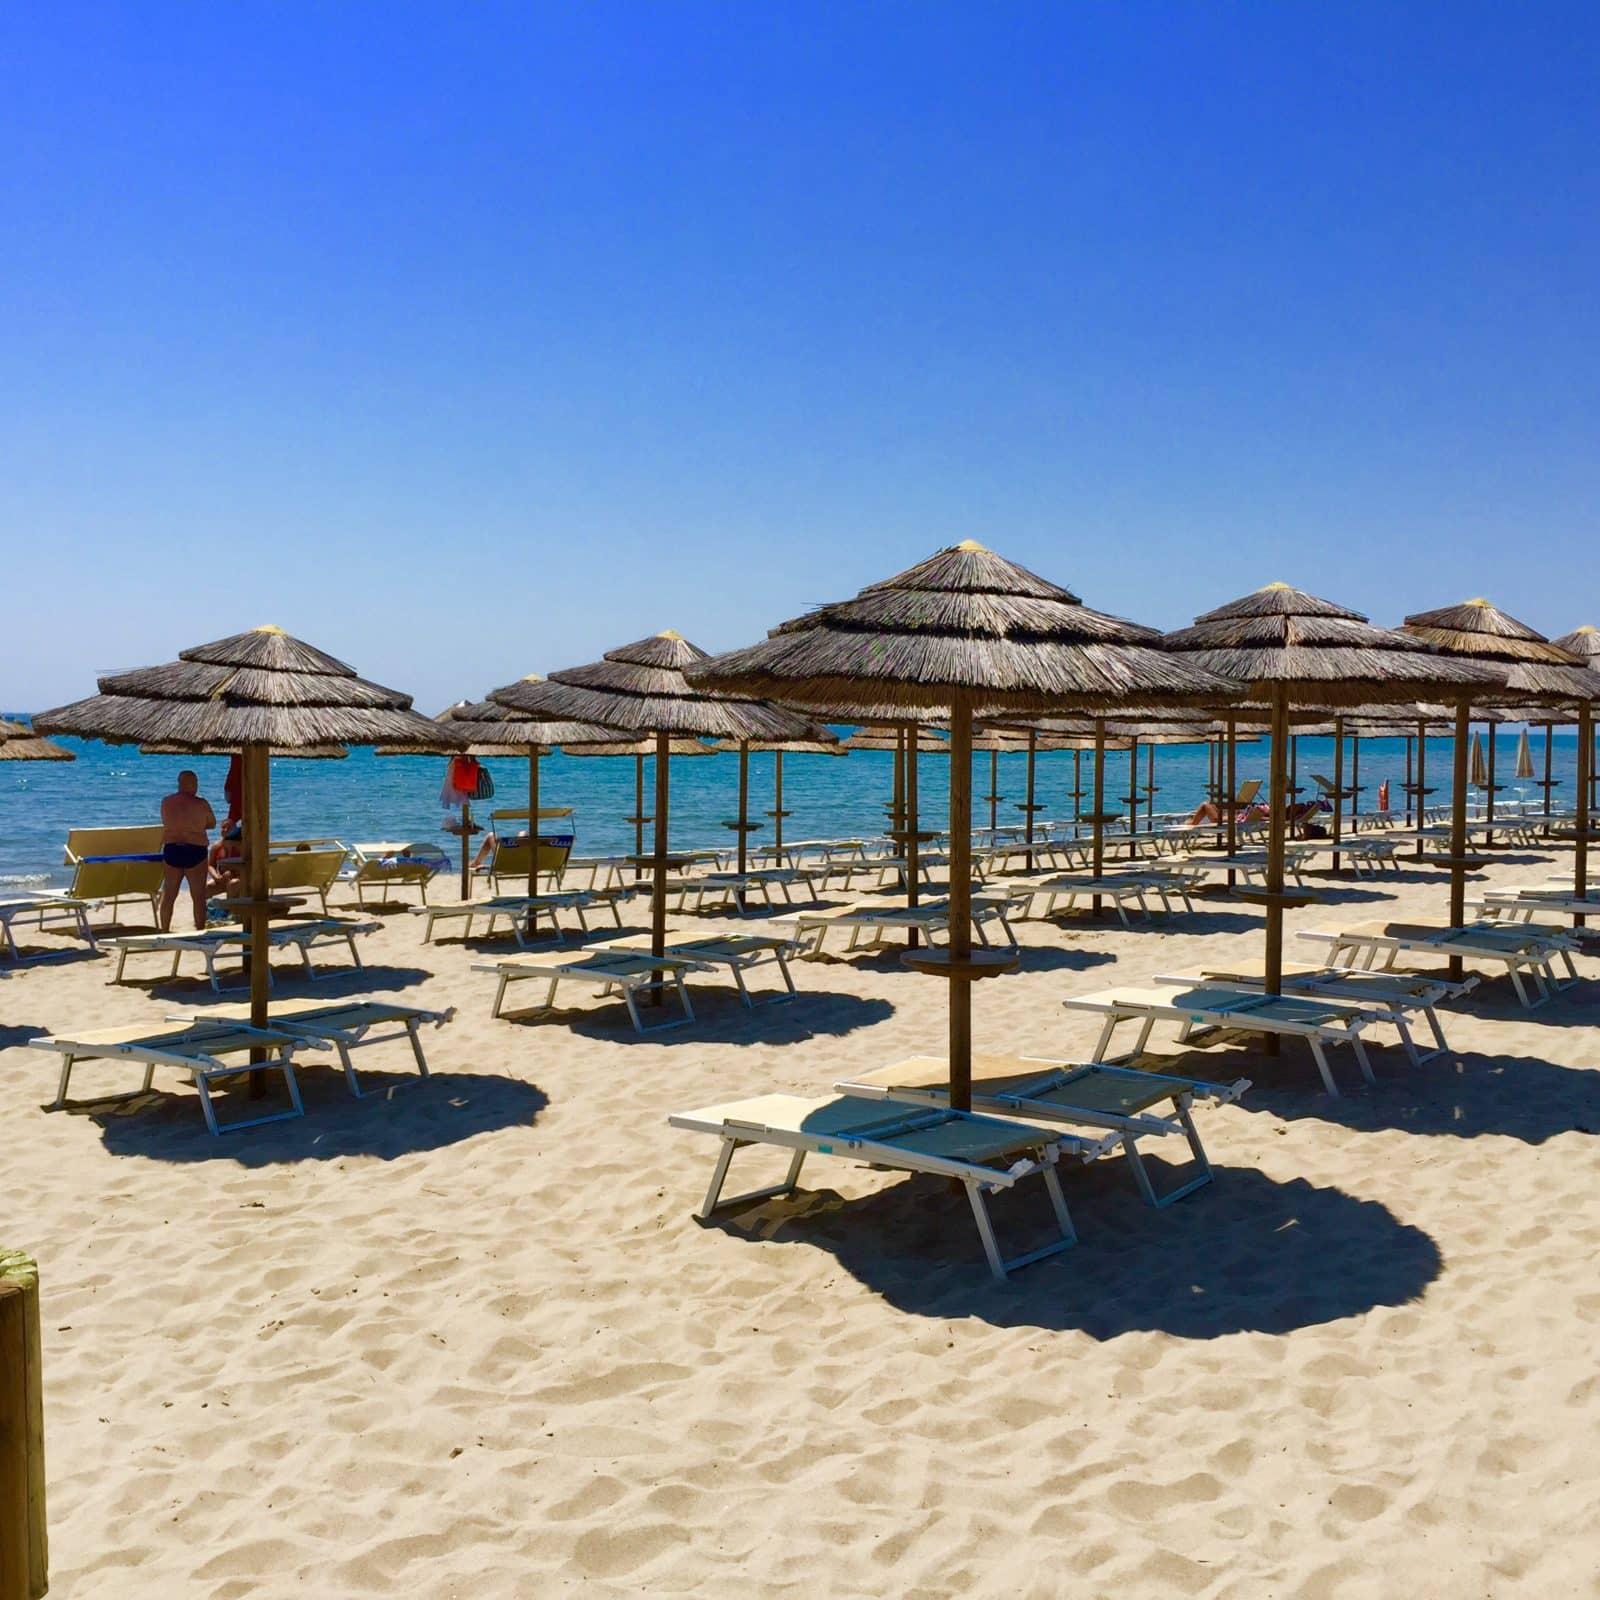 Spiaggia di Lido di Metaponto